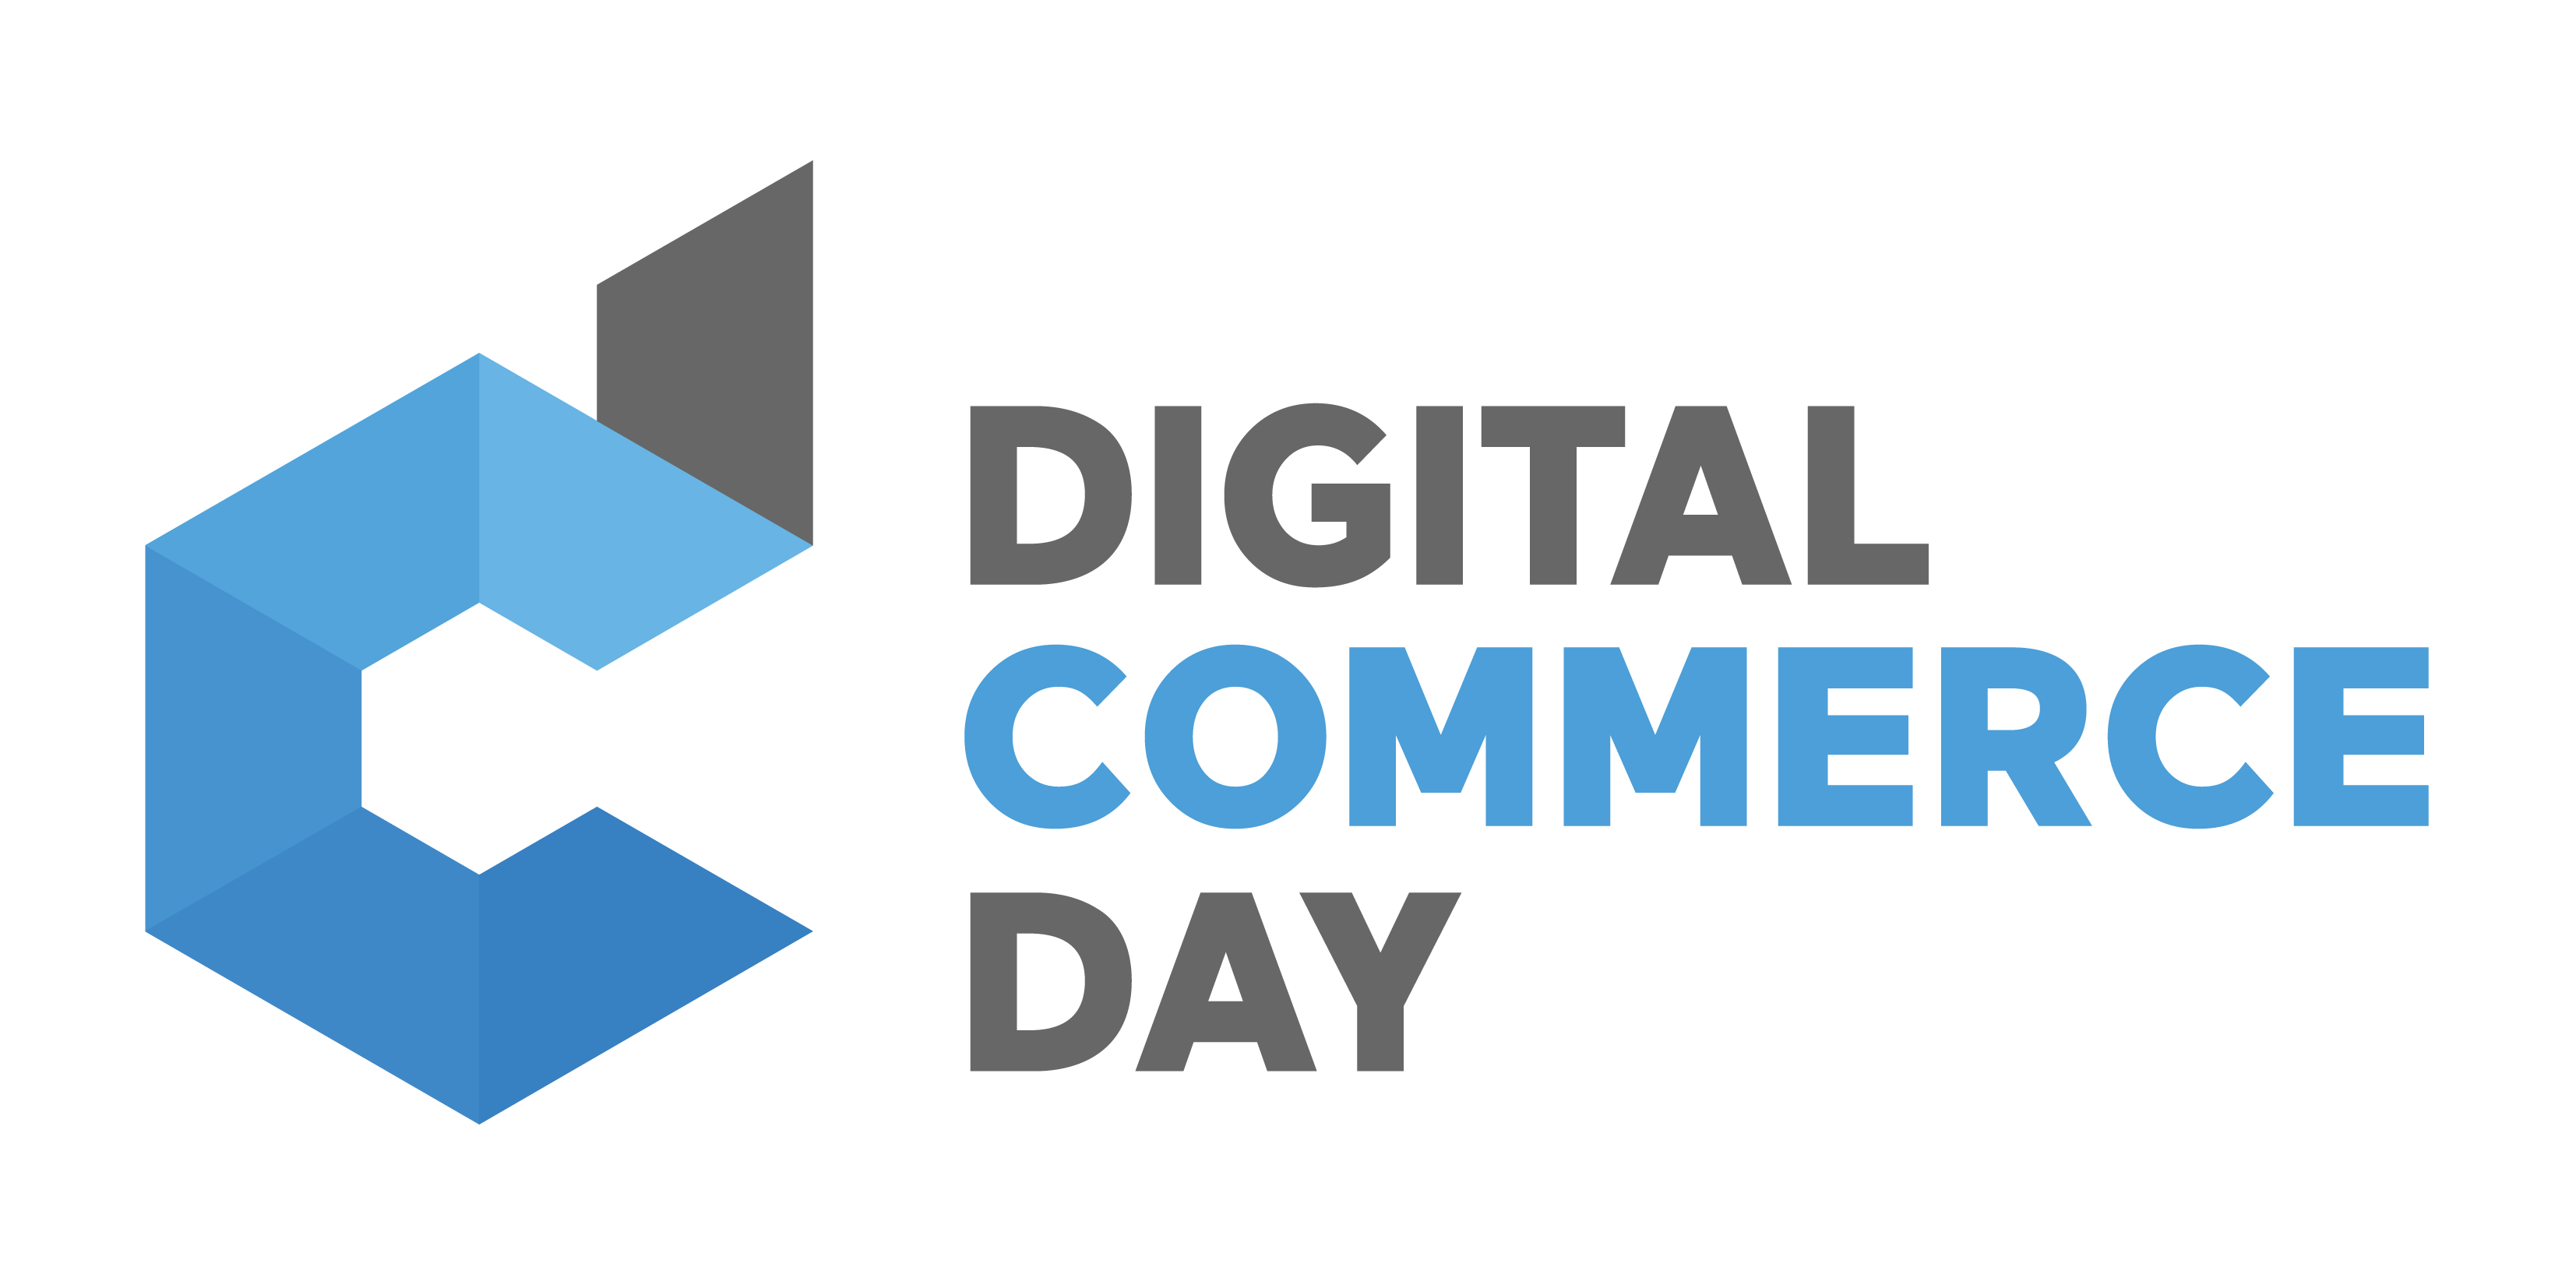 Digital Commerce Day 2019